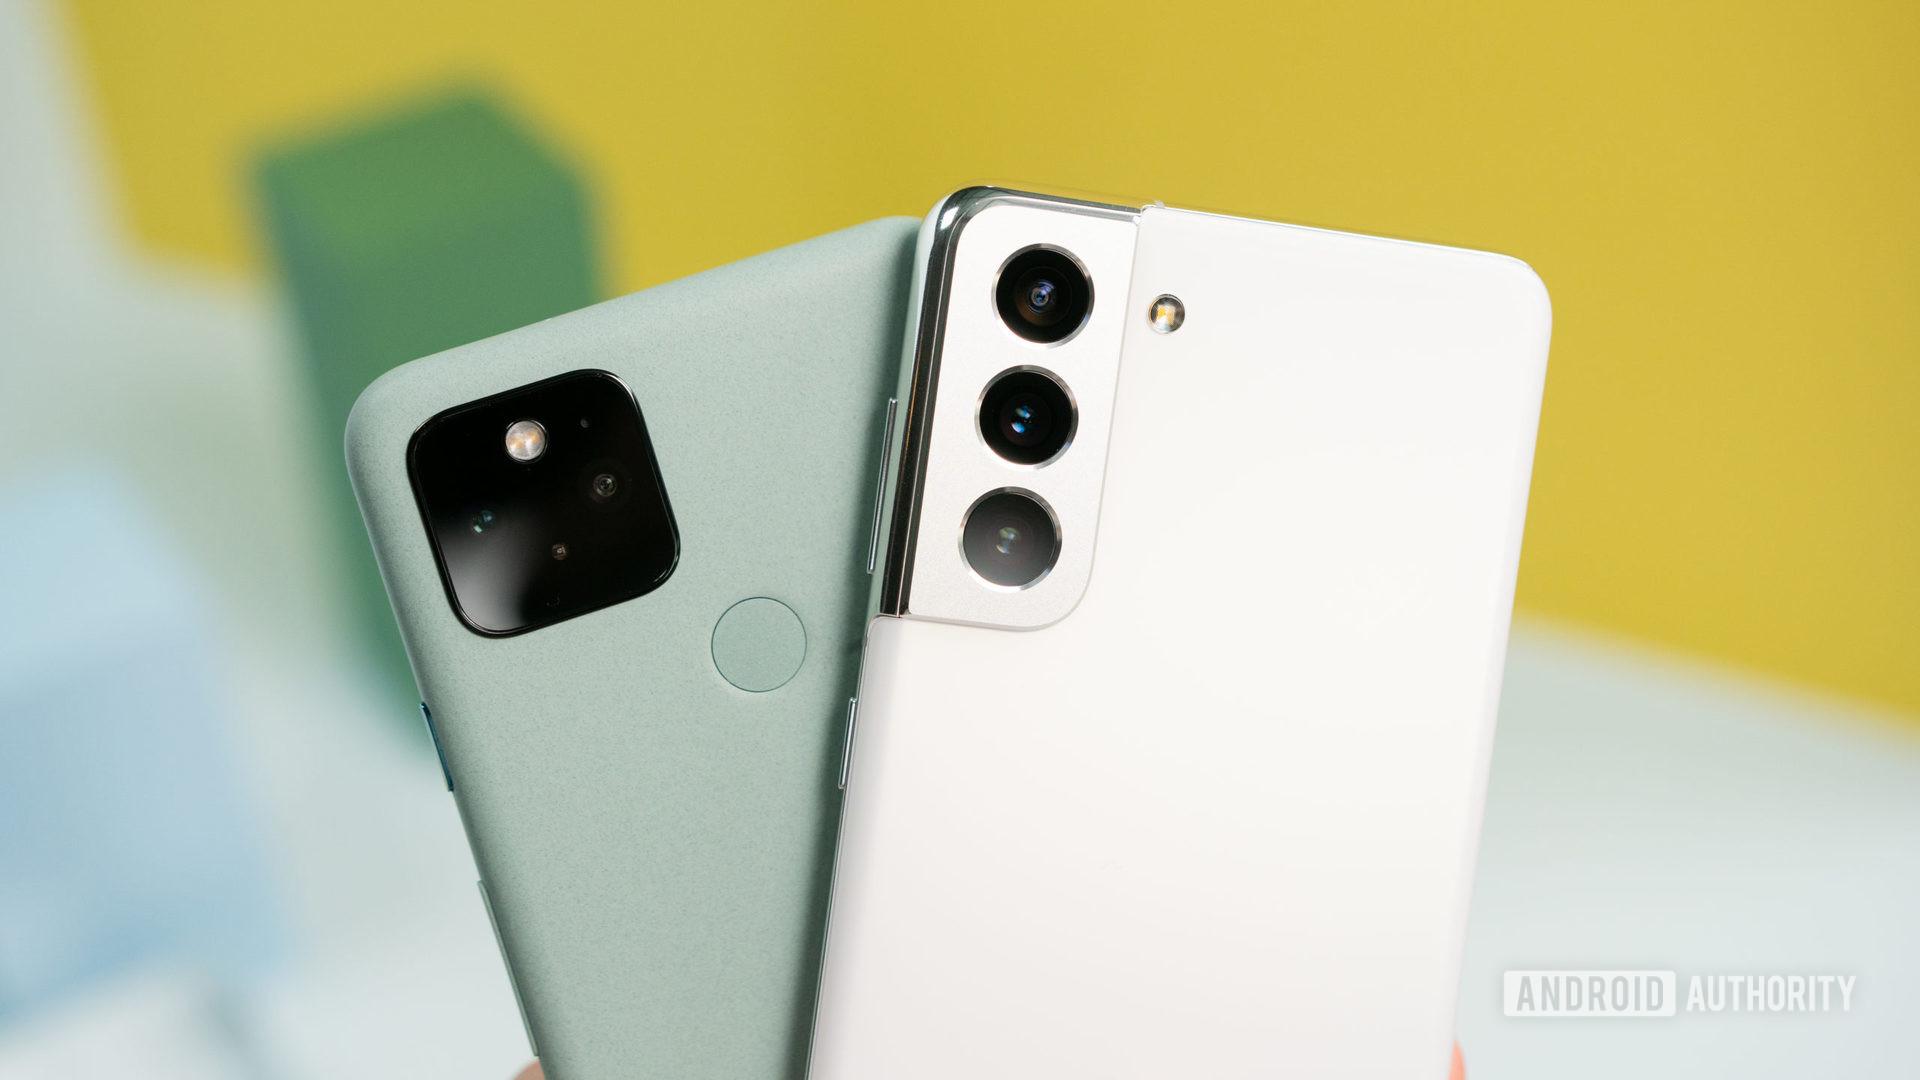 Samsung Galaxy S21 vs Google Pixel 5 cameras